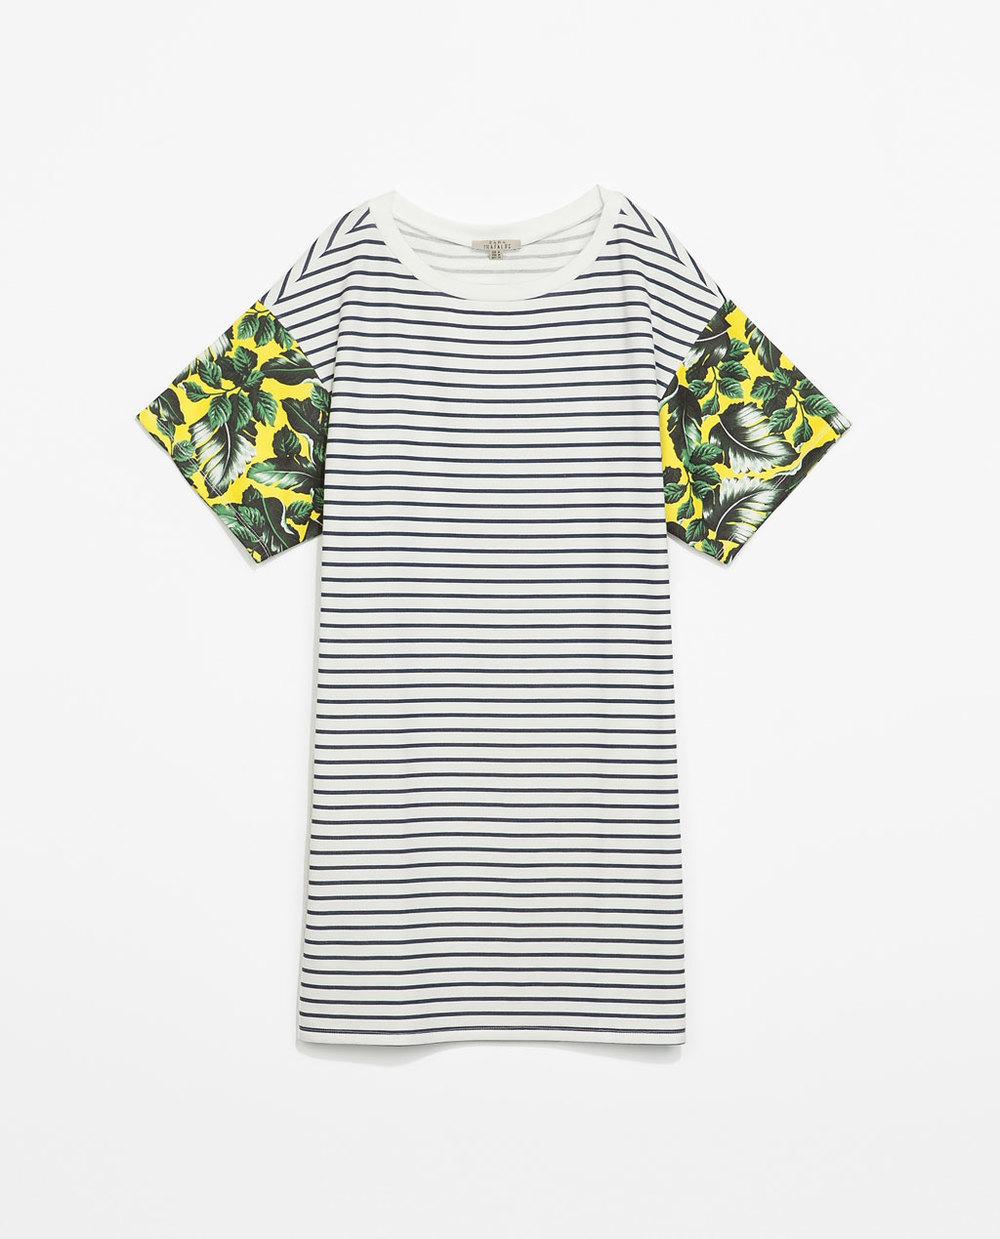 Zara Striped Dress and Tropical Sleeve $35.90